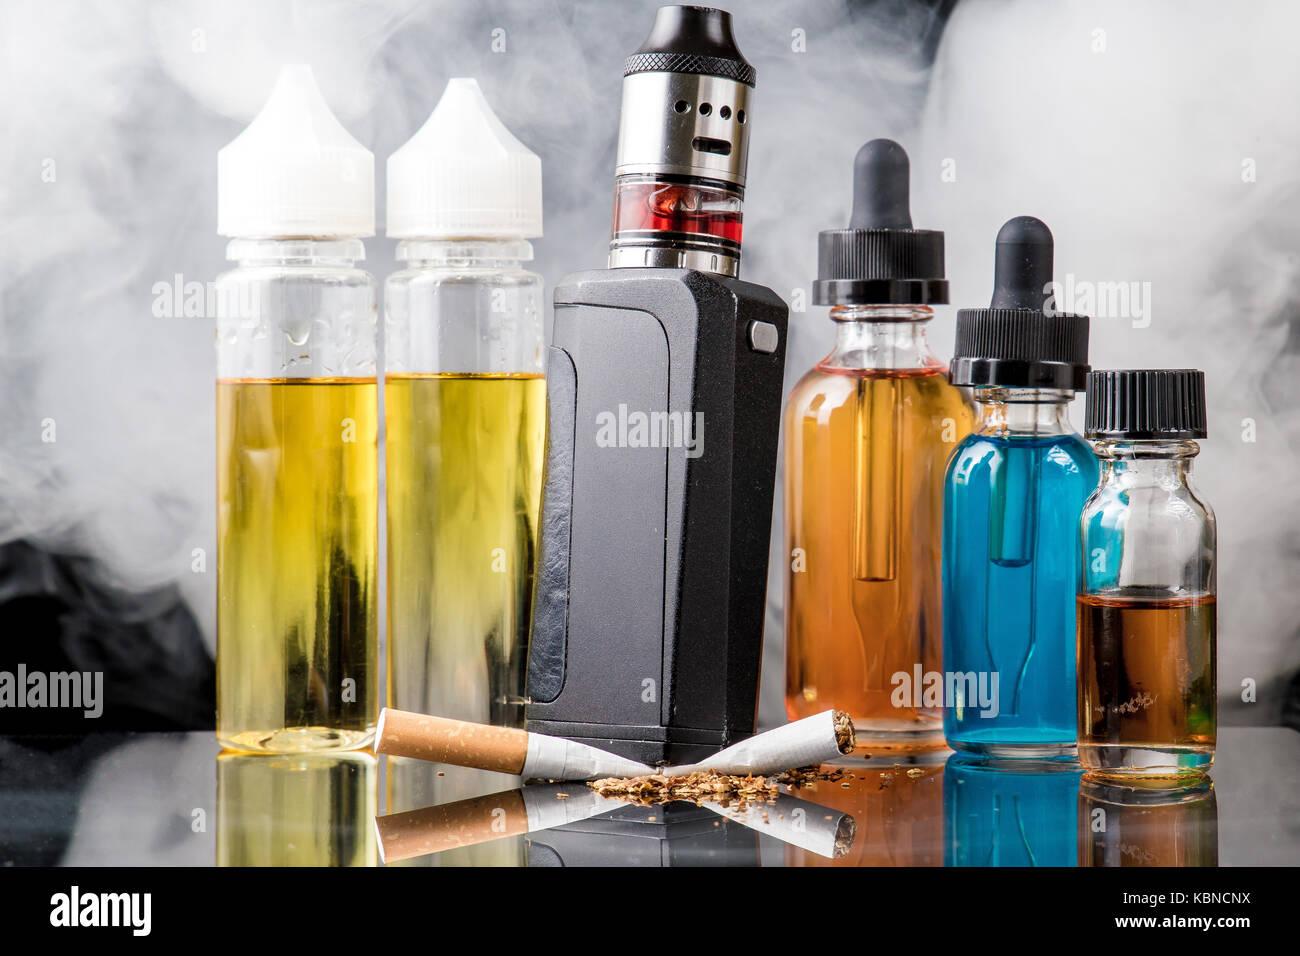 Modern vaporiser versus old tobacco cigarette in smoke cloud - Stock Image